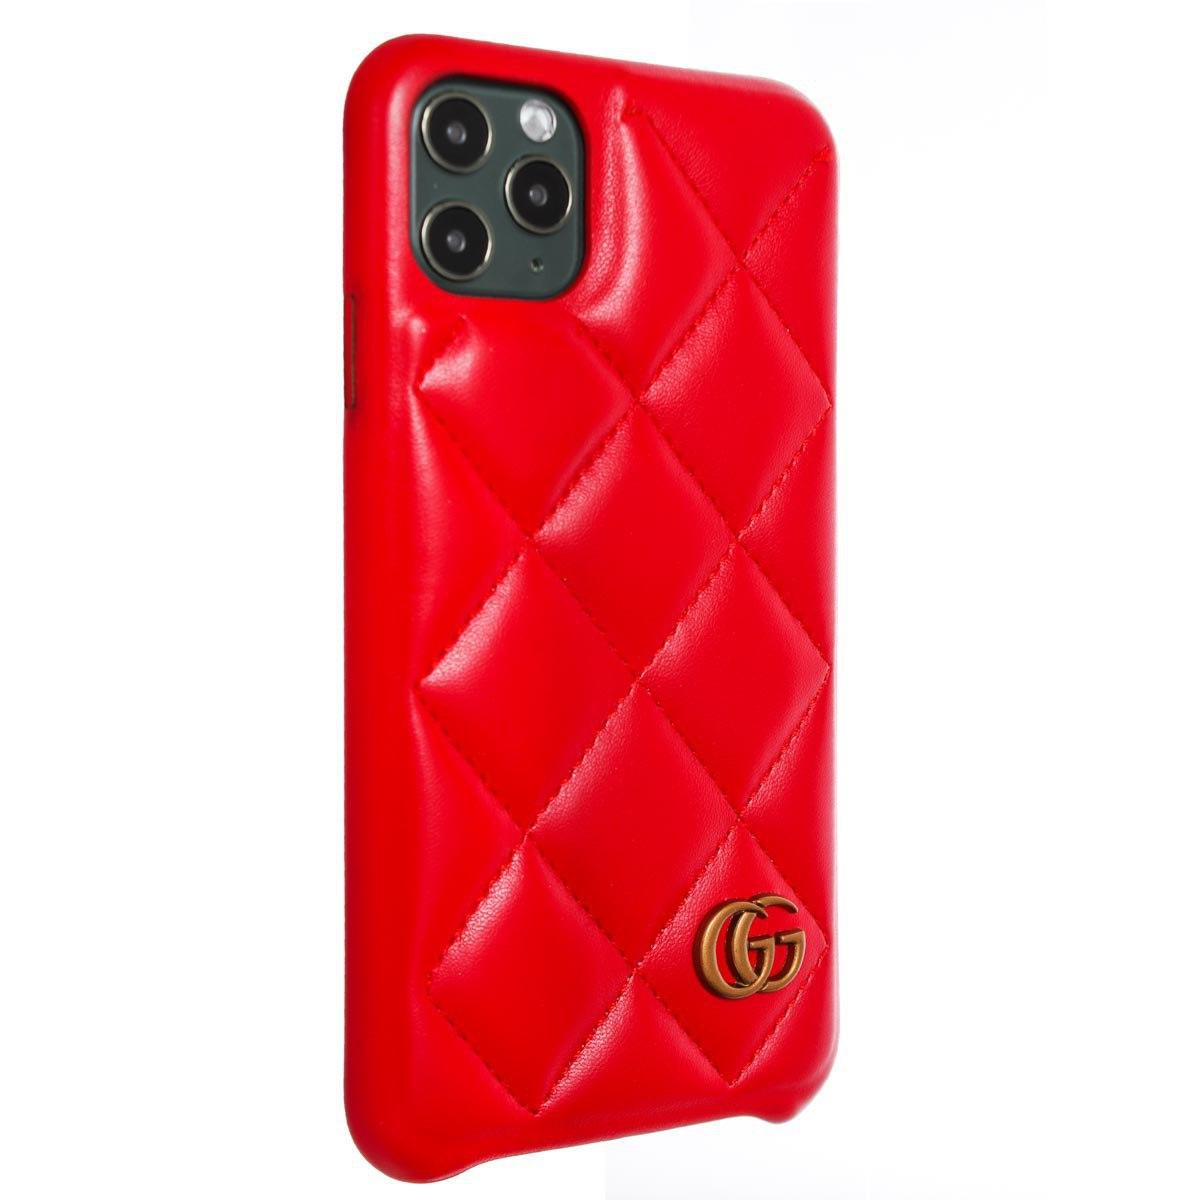 Чехол Leather Gucci Logo накладка iPhone 11, 11 Pro, 11 Pro Max кожаная панель